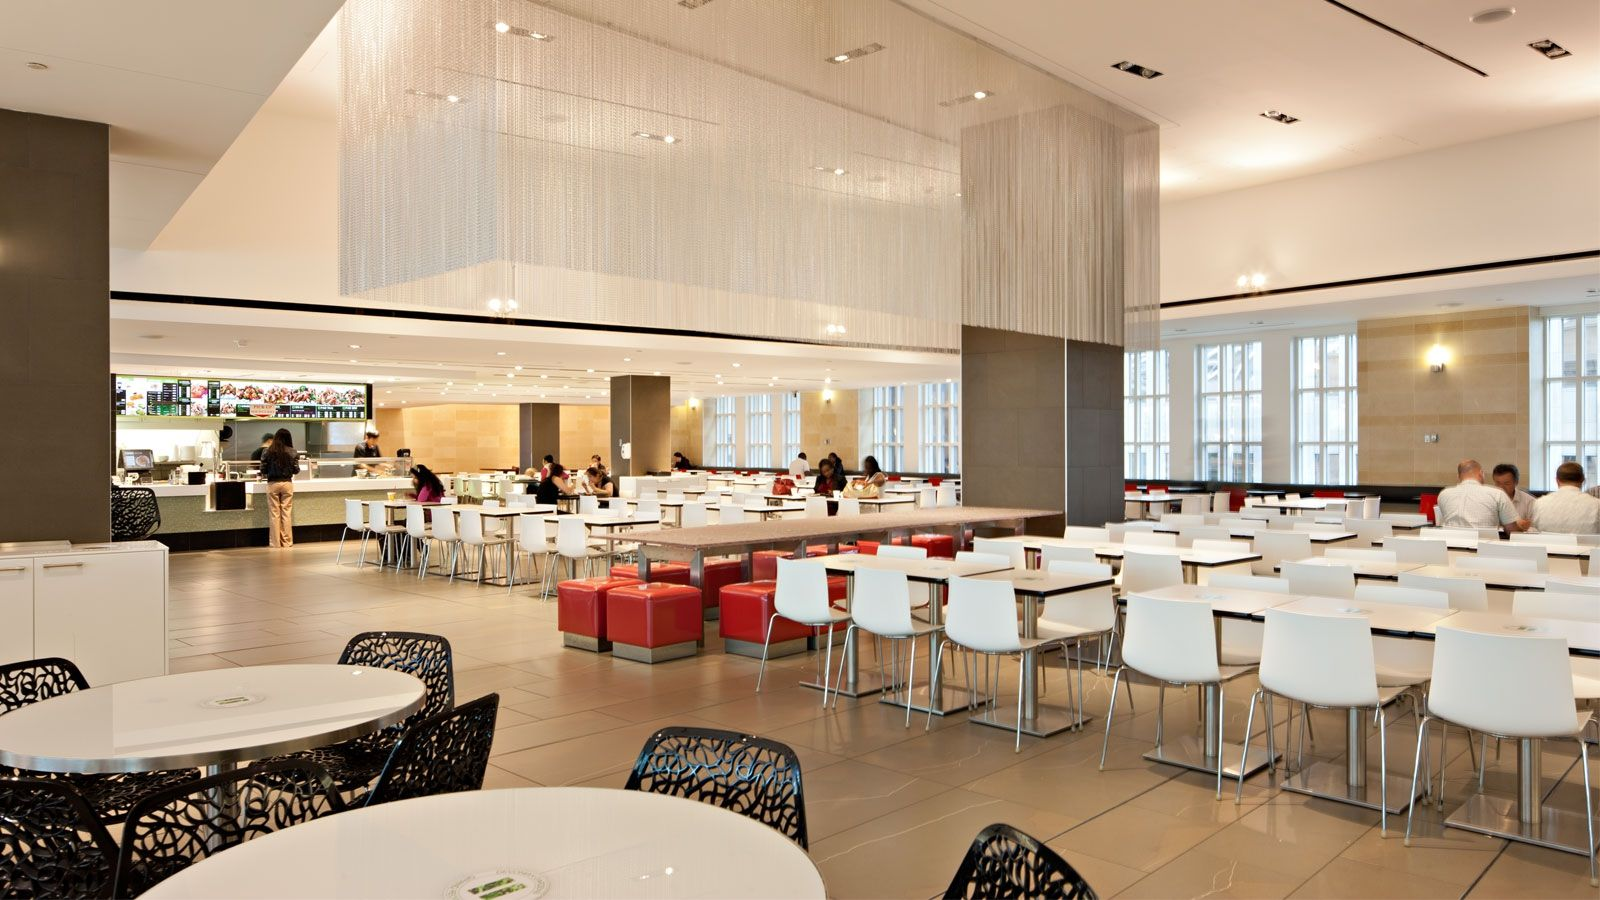 Hambar gha design retail design public spaces for Retail interior design firms